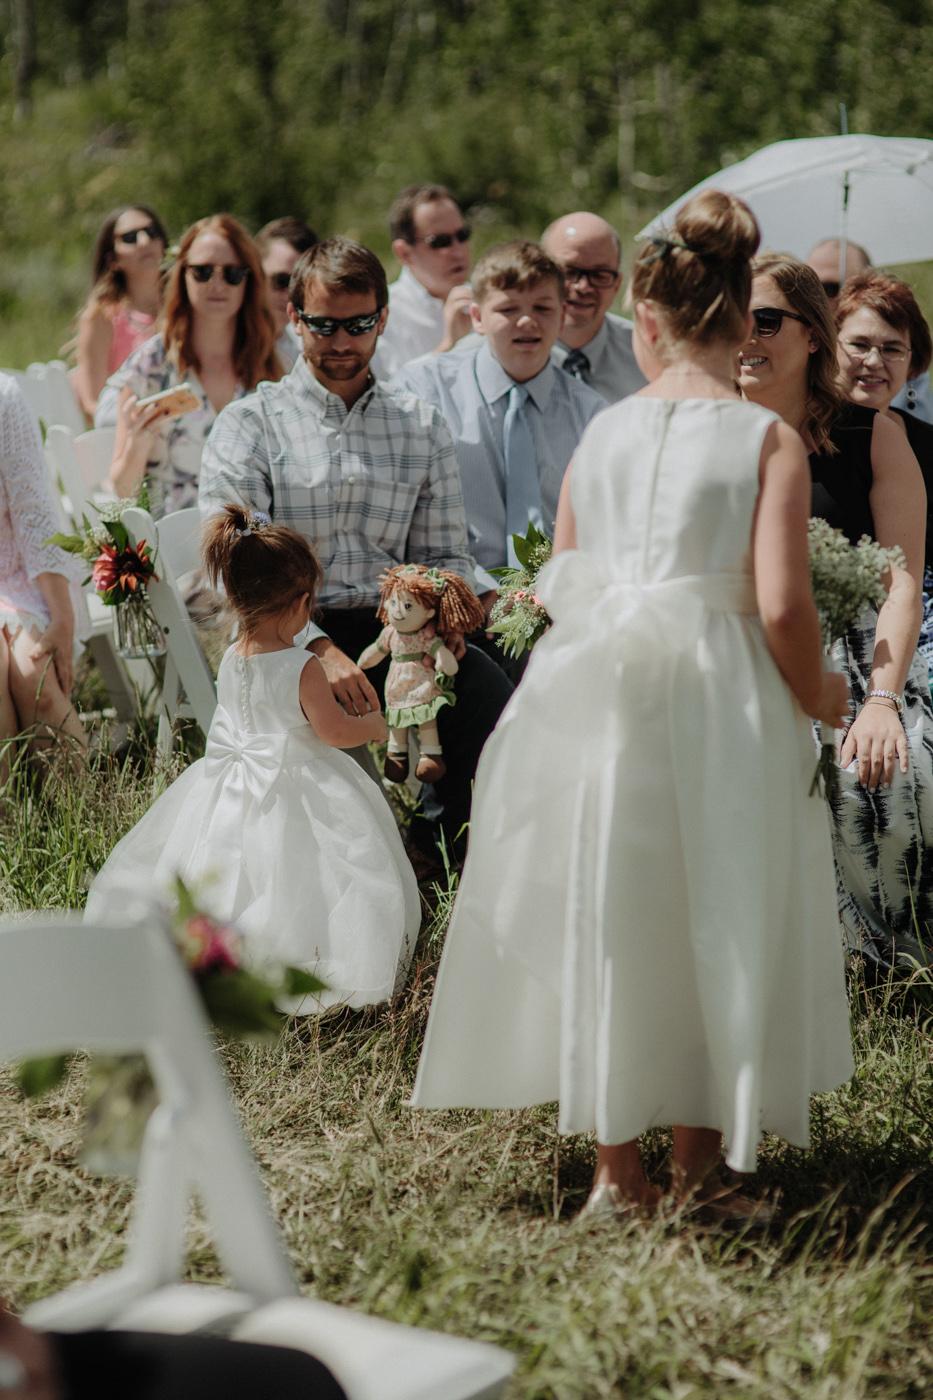 woods-walk-trail-crested-butte-colorado-wedding-33.jpg